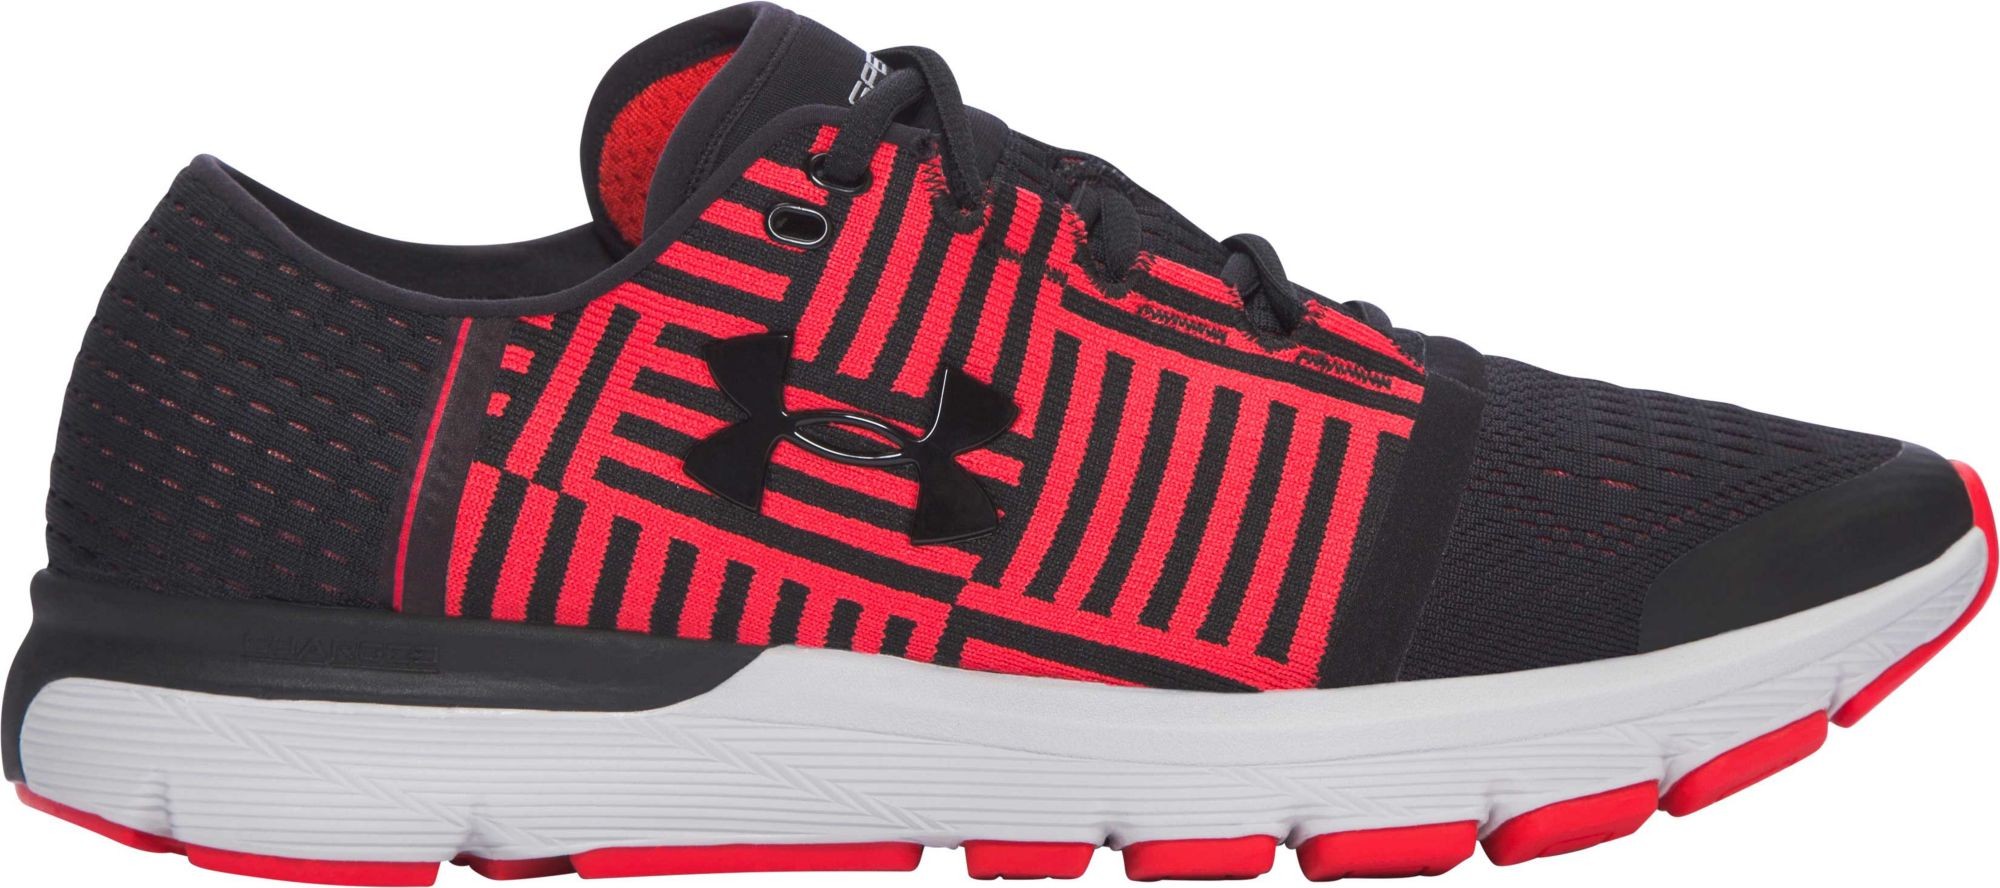 under armour new shoes. under armour men\u0027s speedform gemini 3 running shoes new